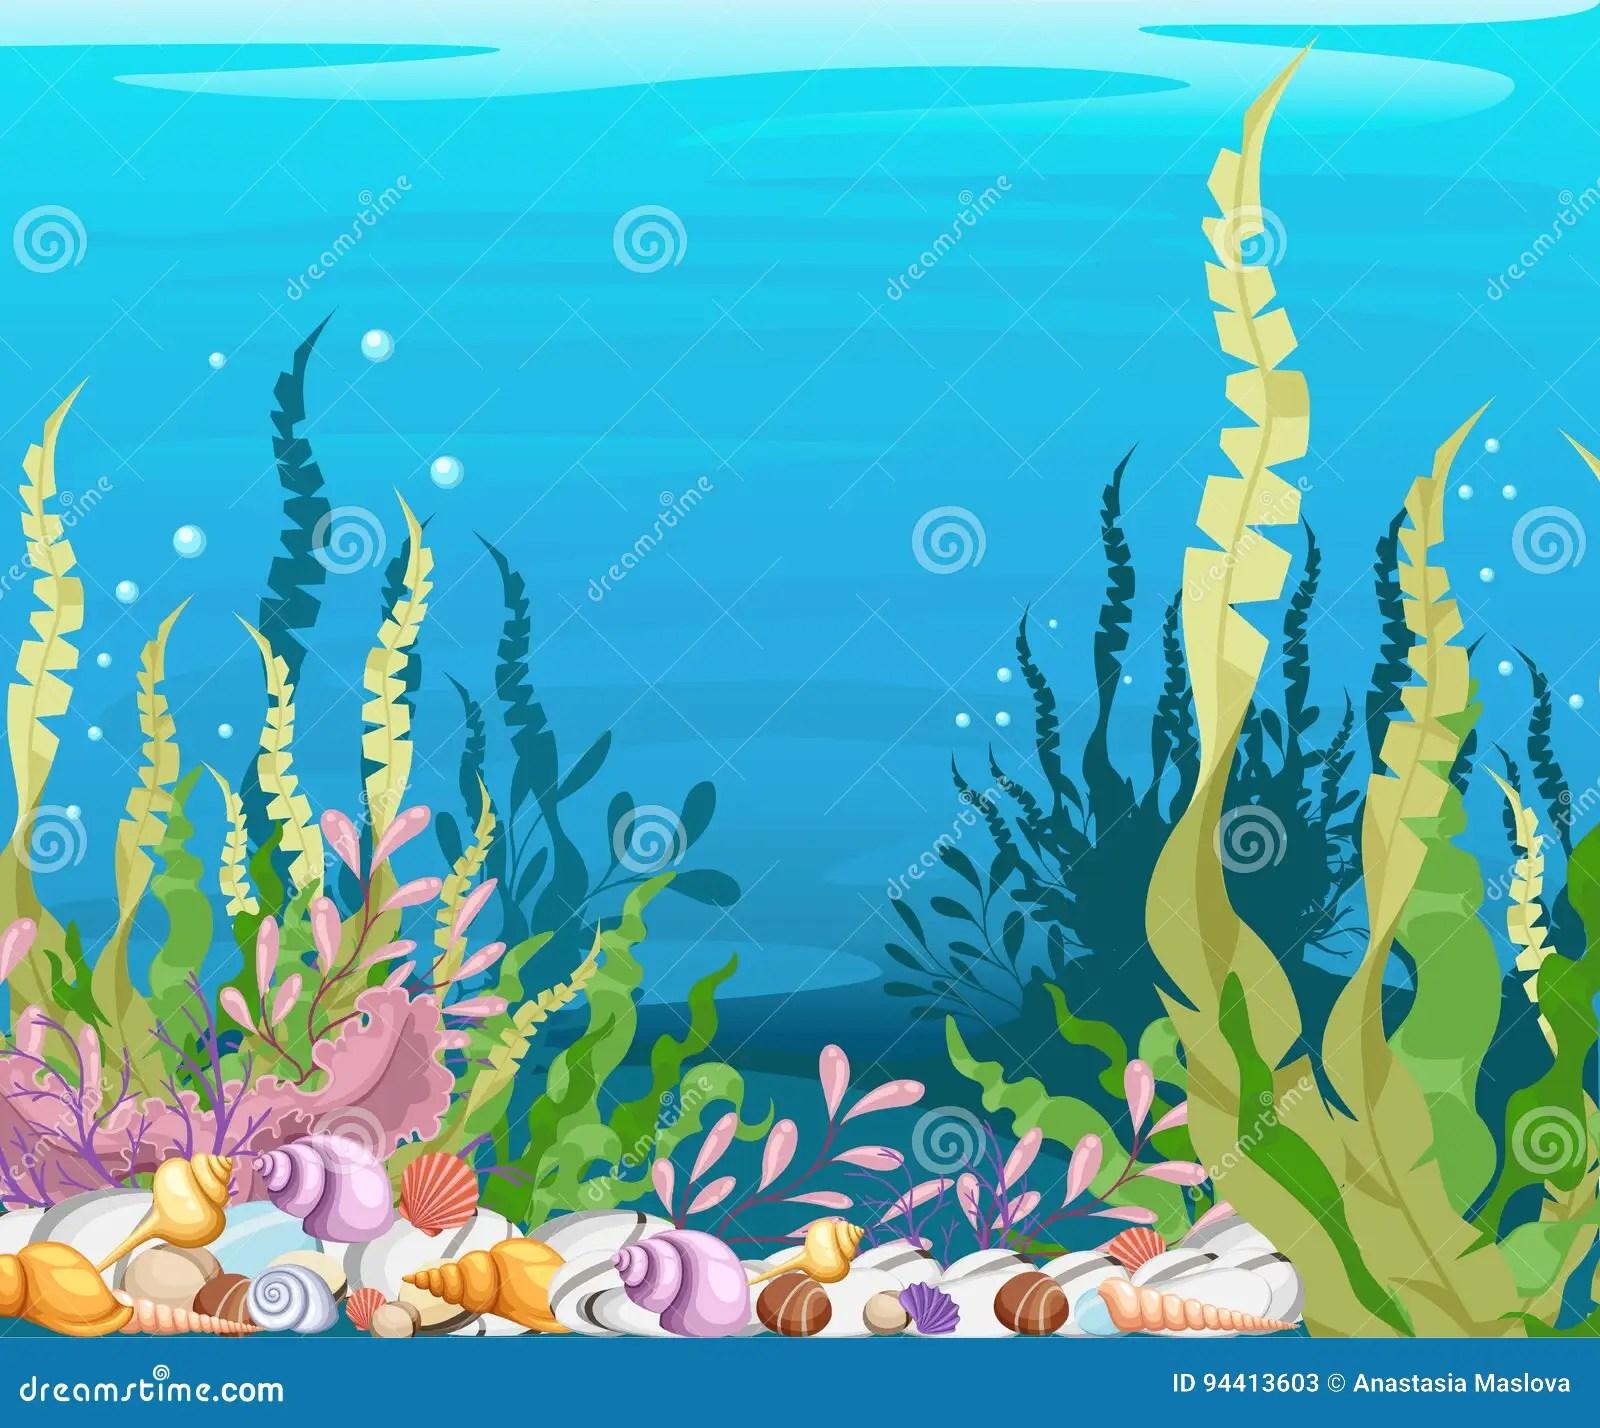 Under The Sea Background Marine Life Landscape